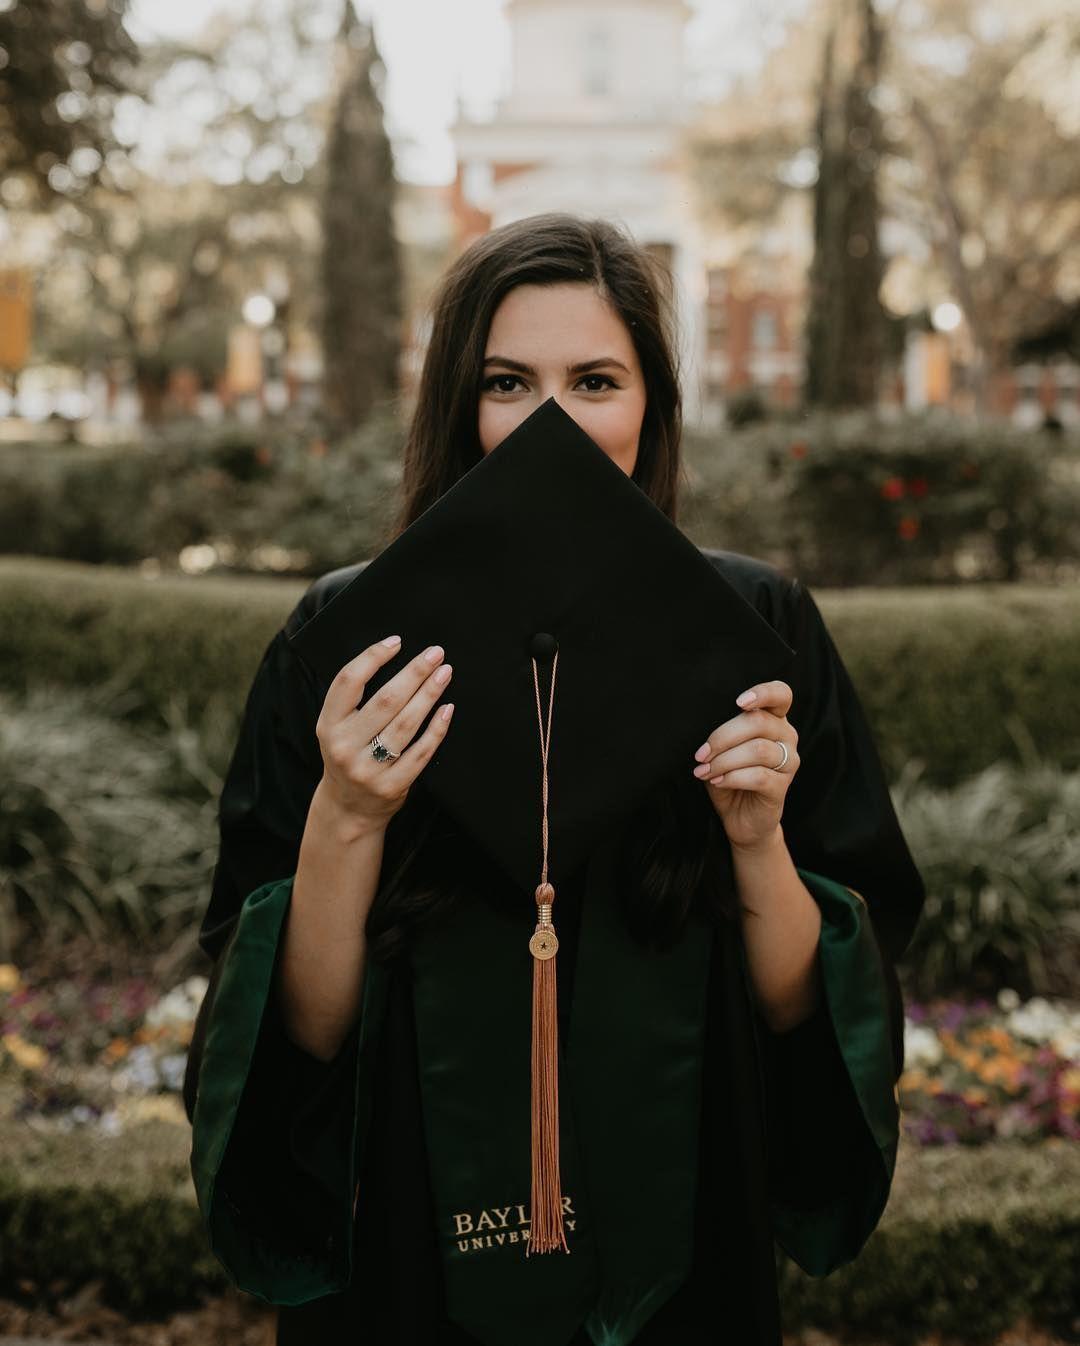 Senior Pictures | Cap and gown photos | College graduation portraits